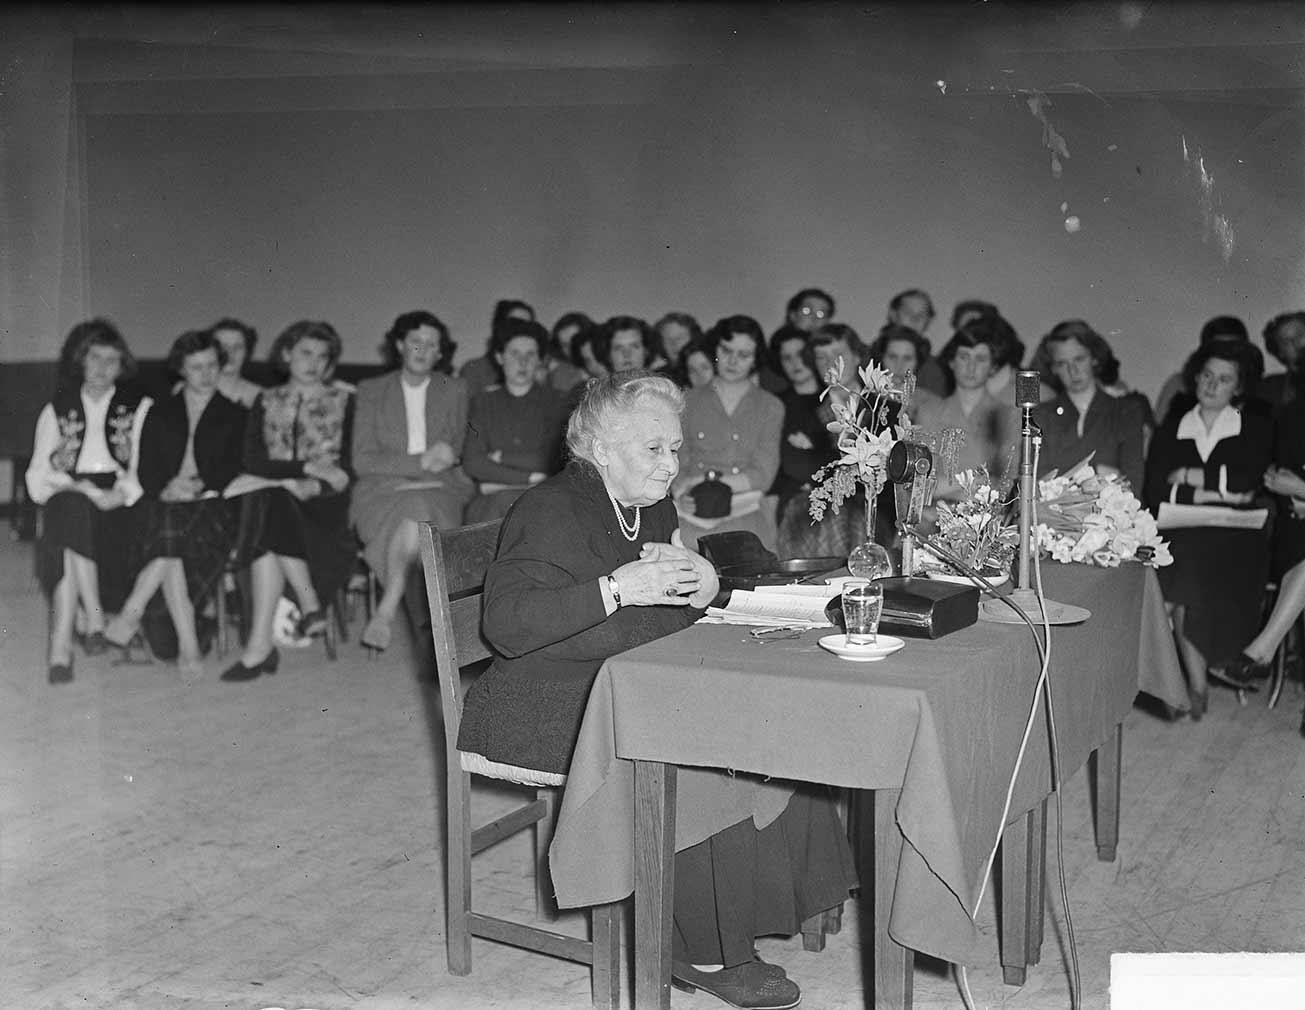 Maria Montessori lors d'une conférence